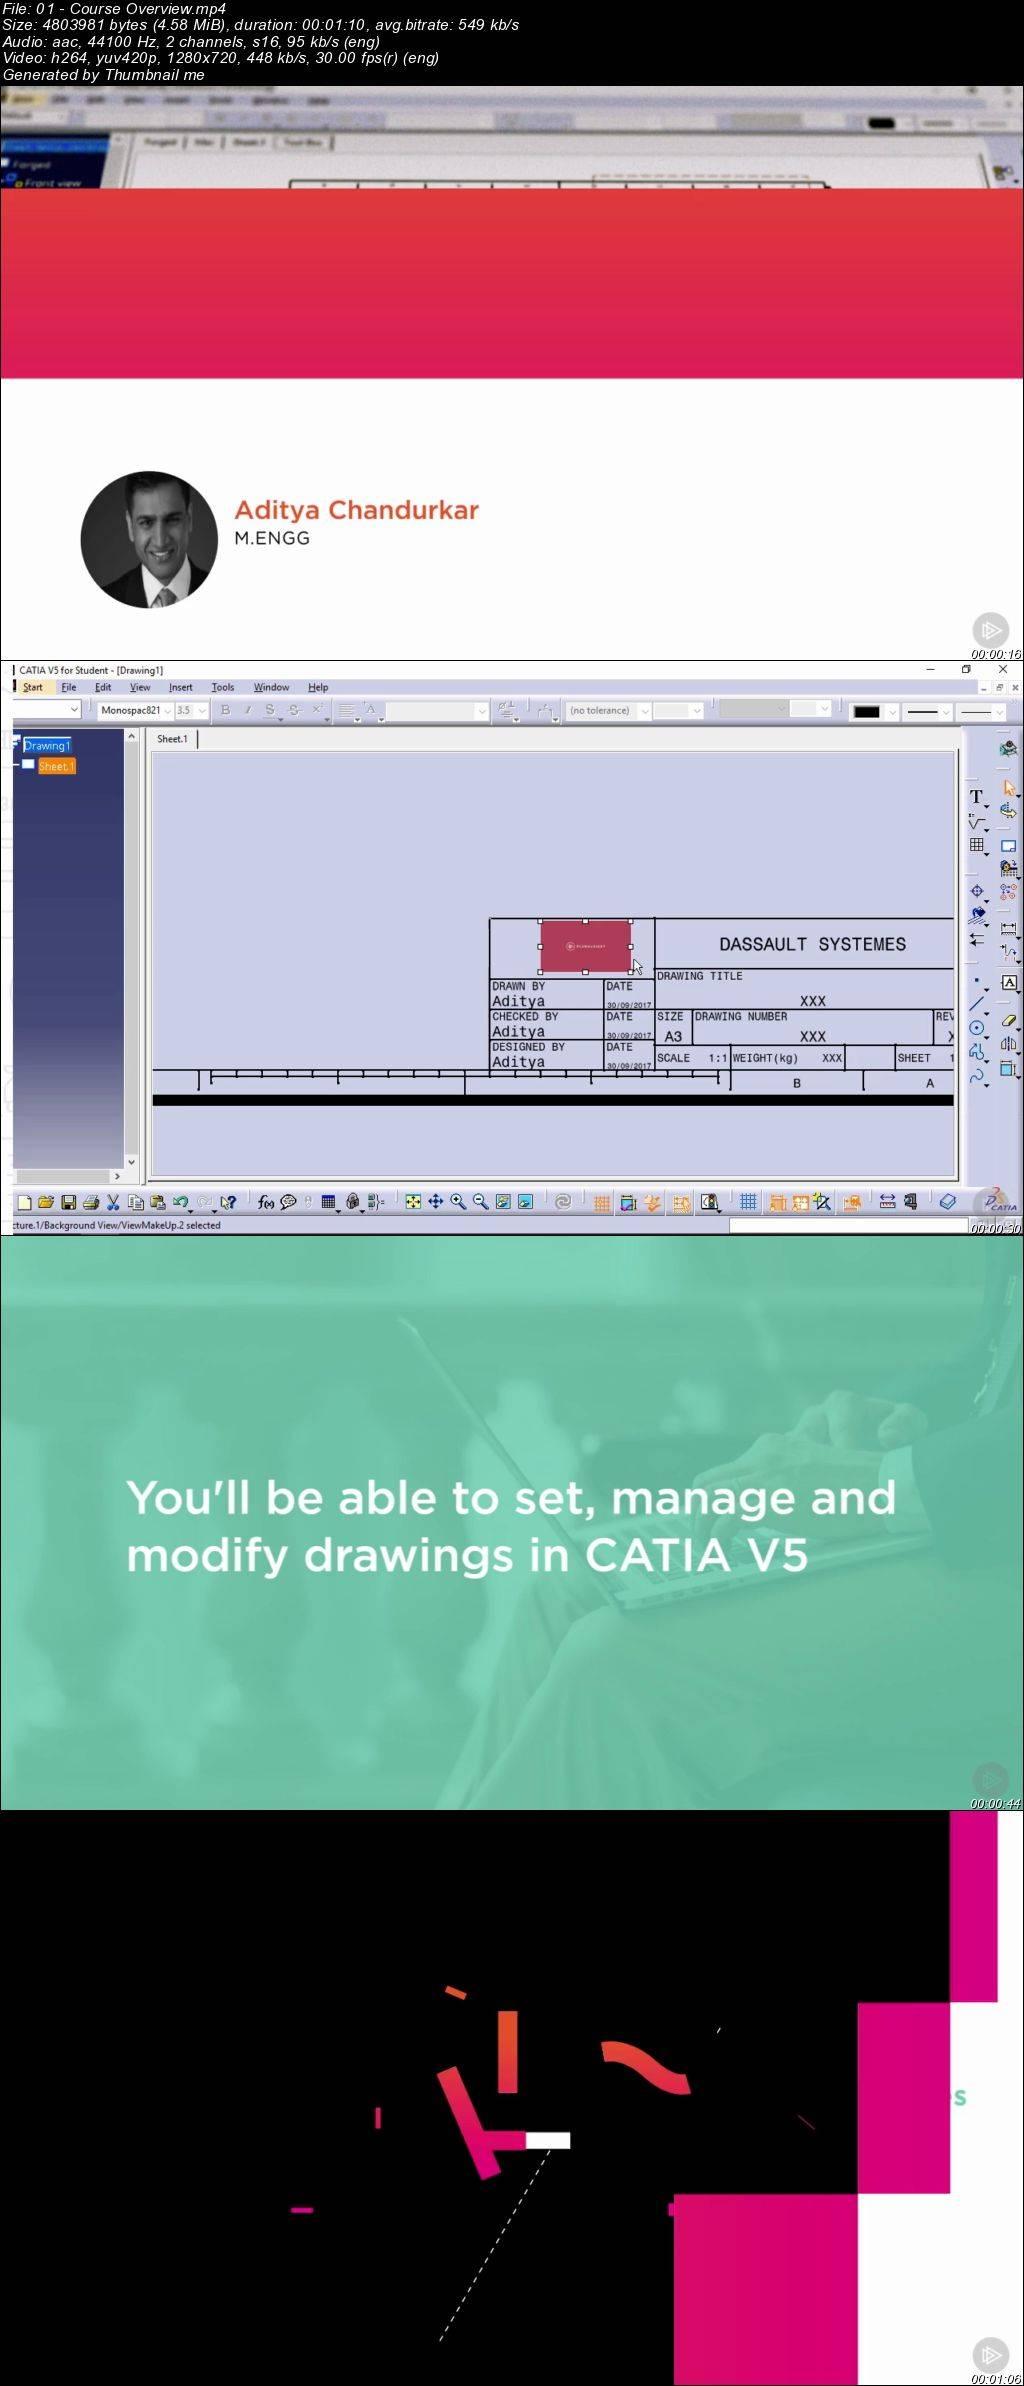 CATIA V5 Essentials: In-depth Drawings / AvaxHome